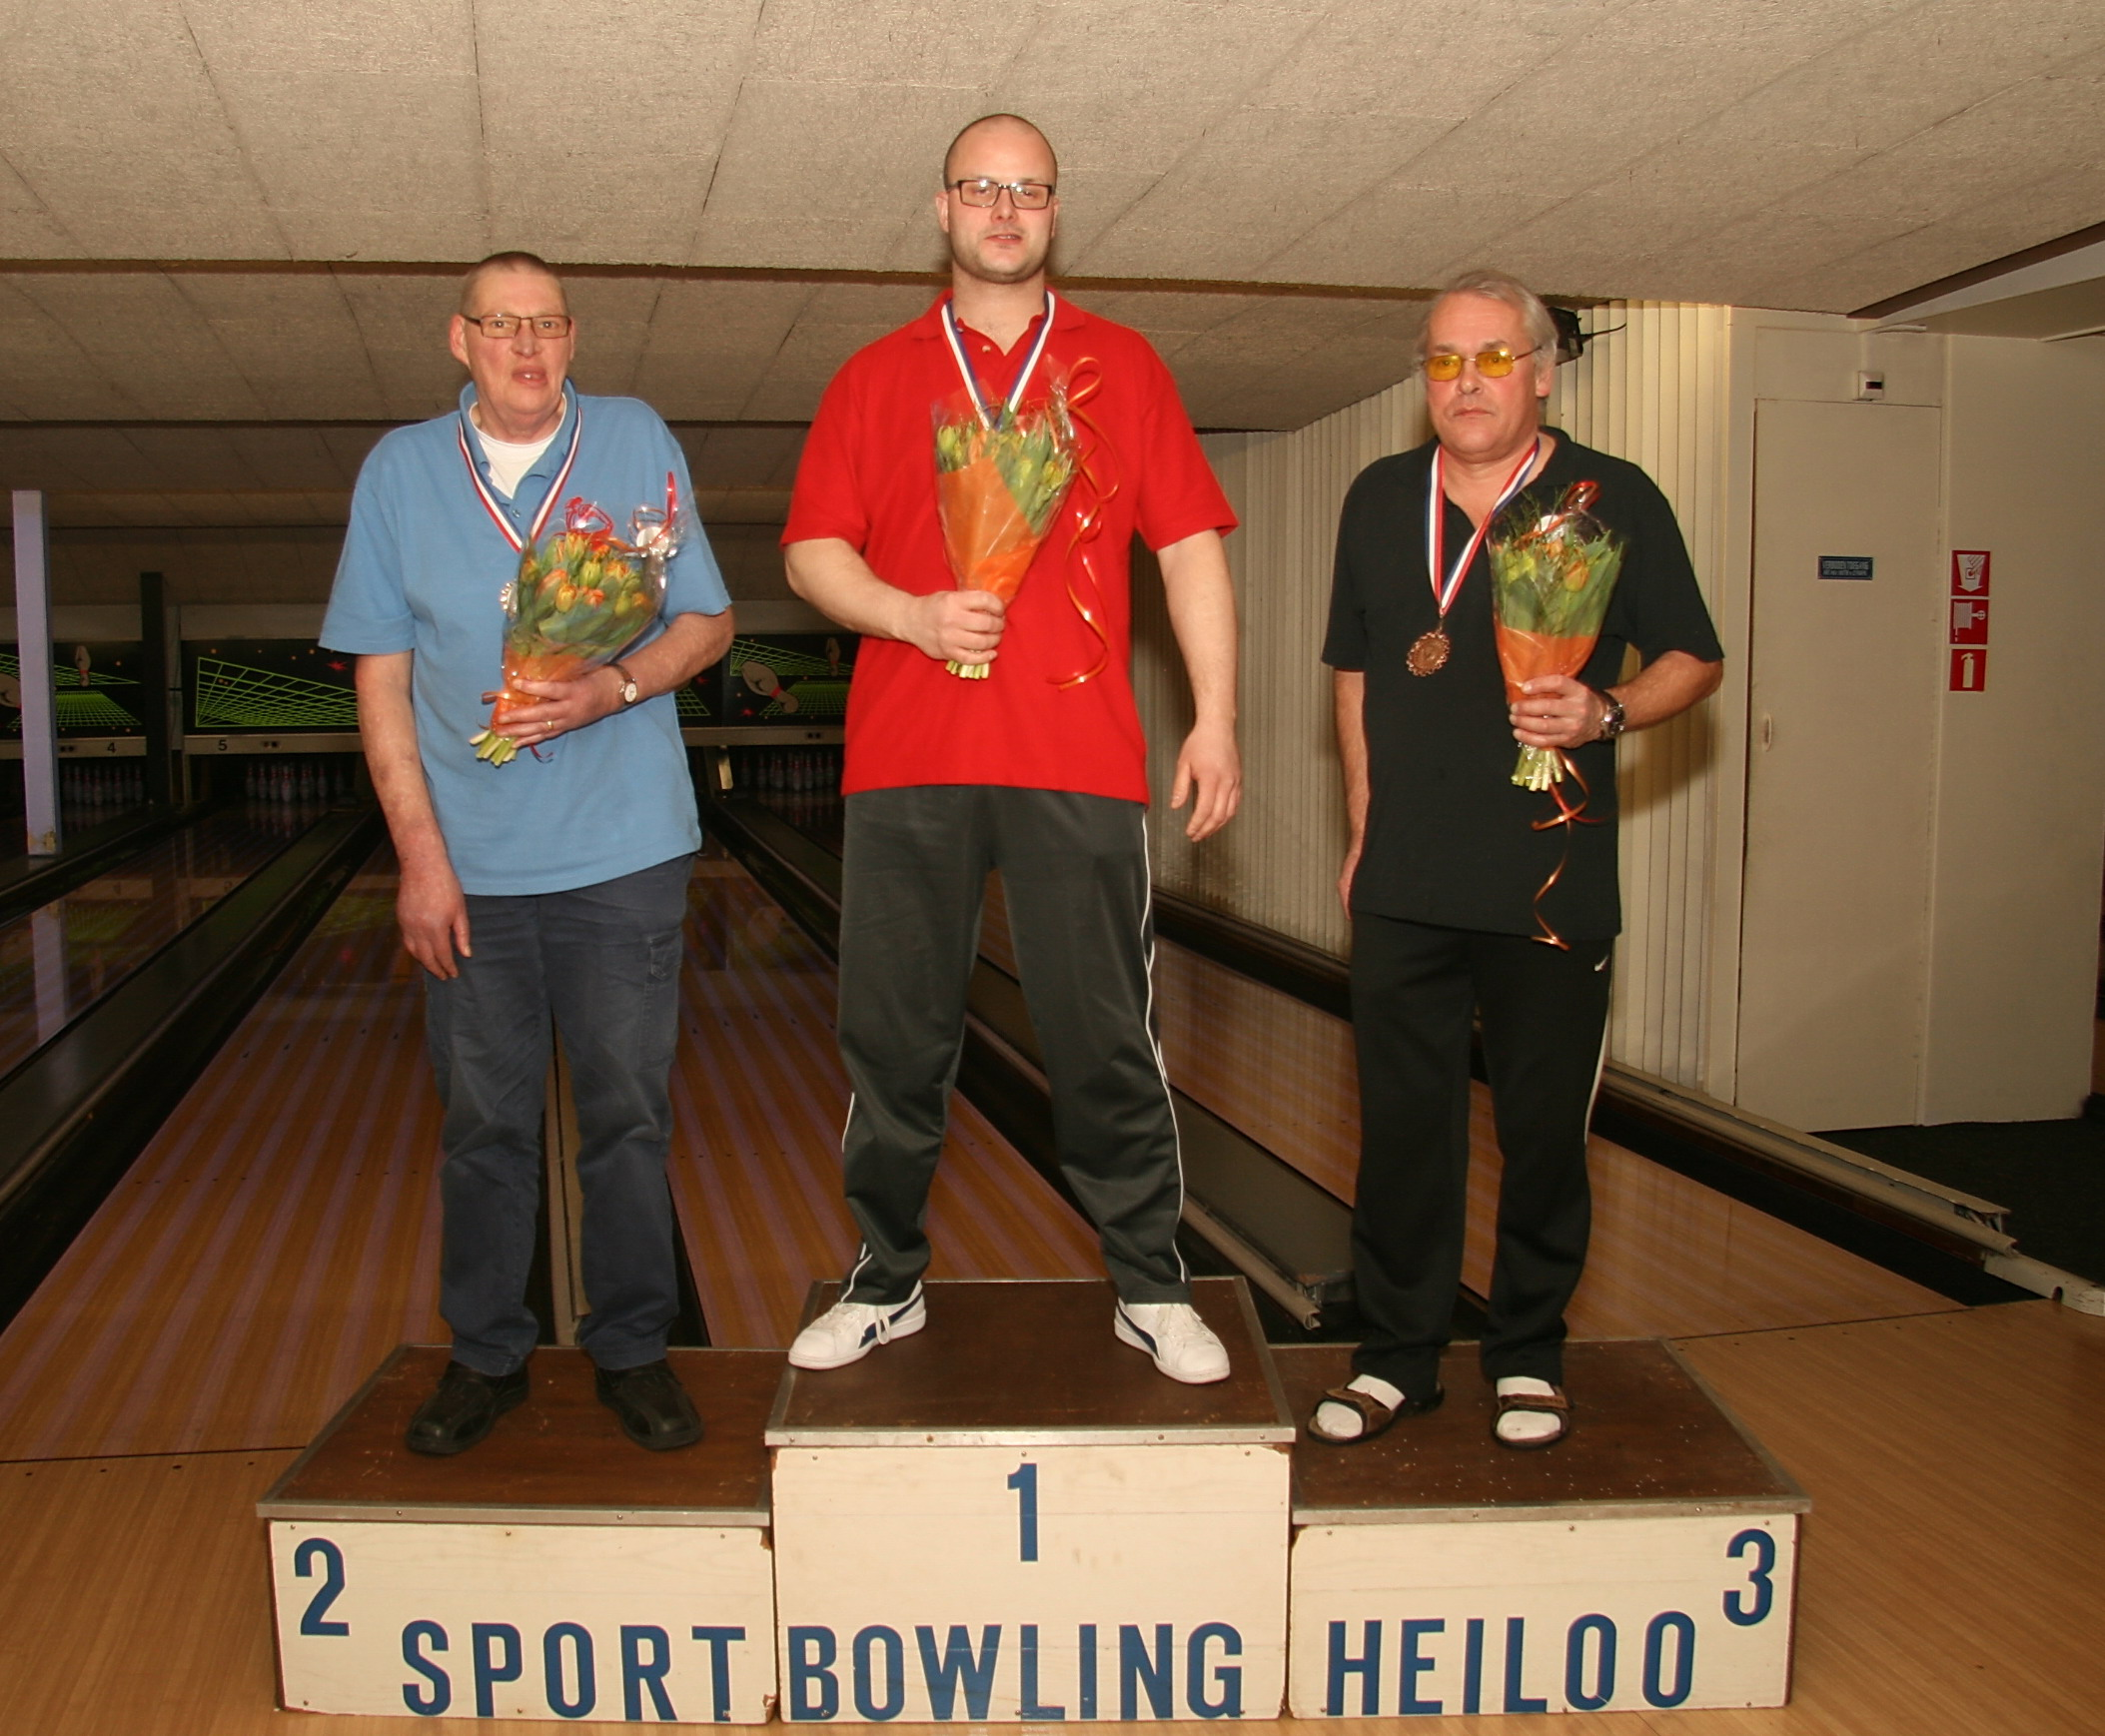 http://www.bowlingverenigingheiloo.nl/fotos_verhalen/foto's/2013_0214-Ver.kamp-Heren-CD.jpg